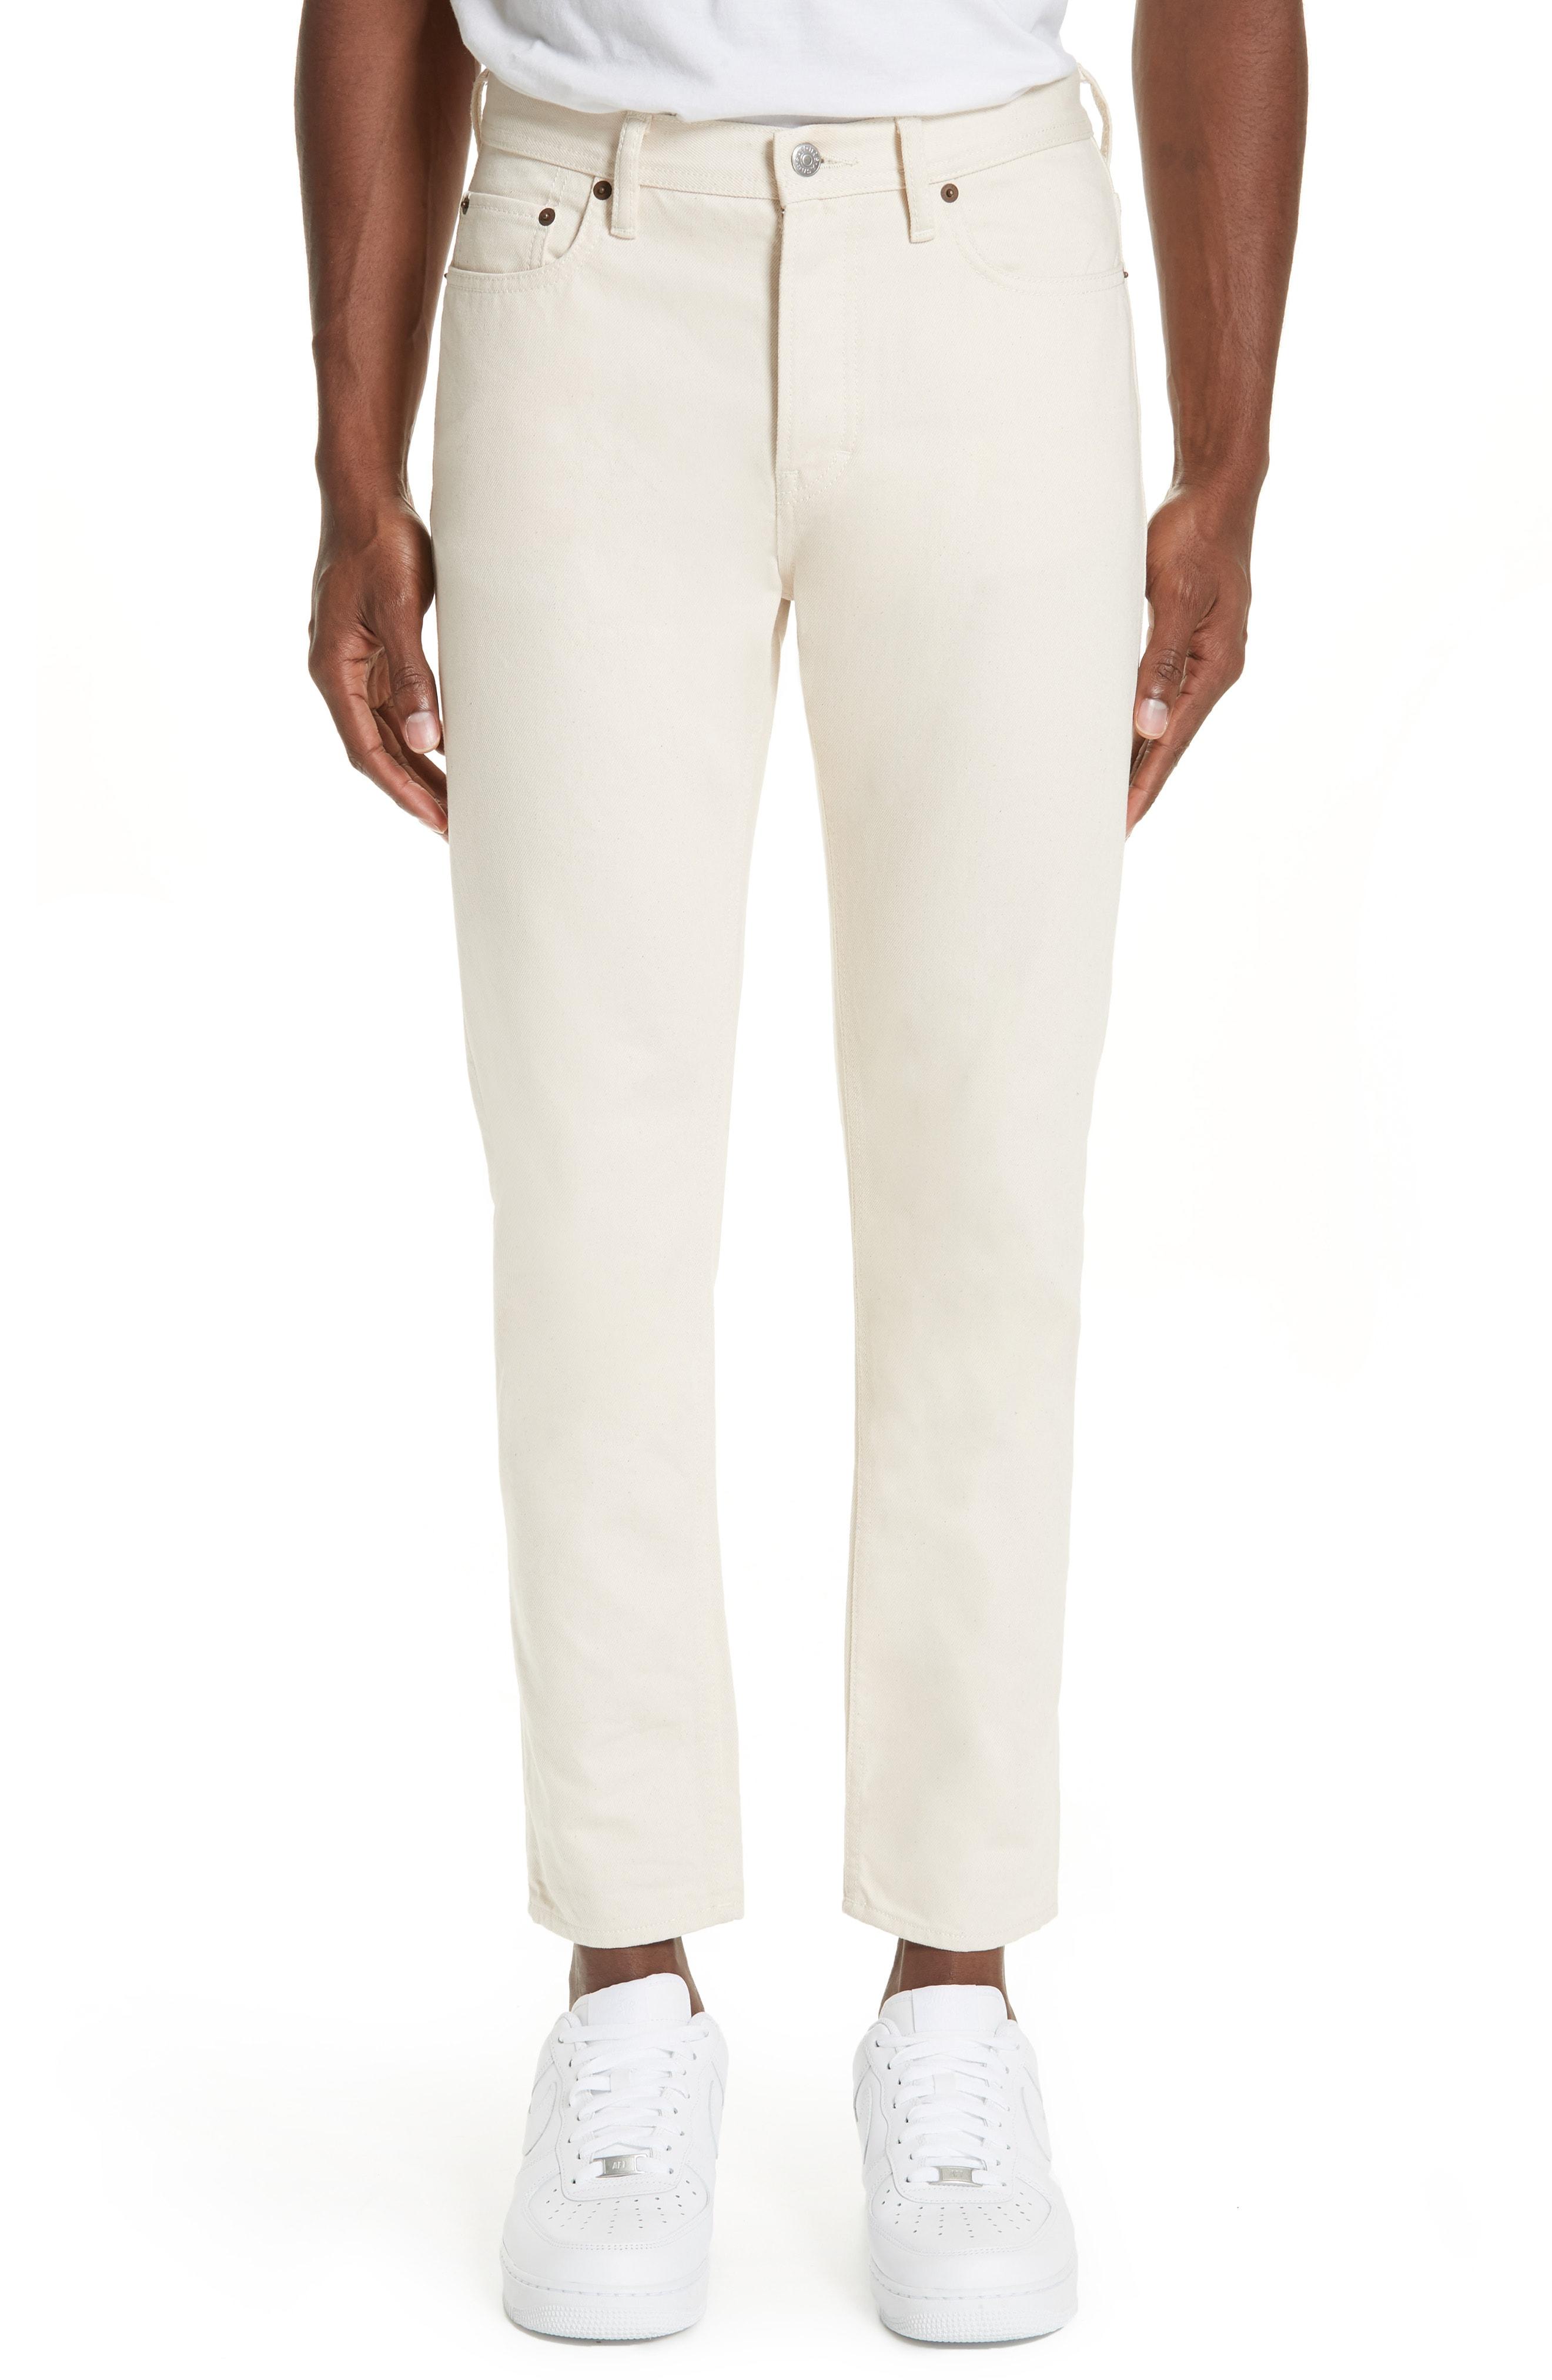 ae2772ea Men's Acne Studios North Skinny Fit Jeans, Size 29 x 34 – White | The  Fashionisto